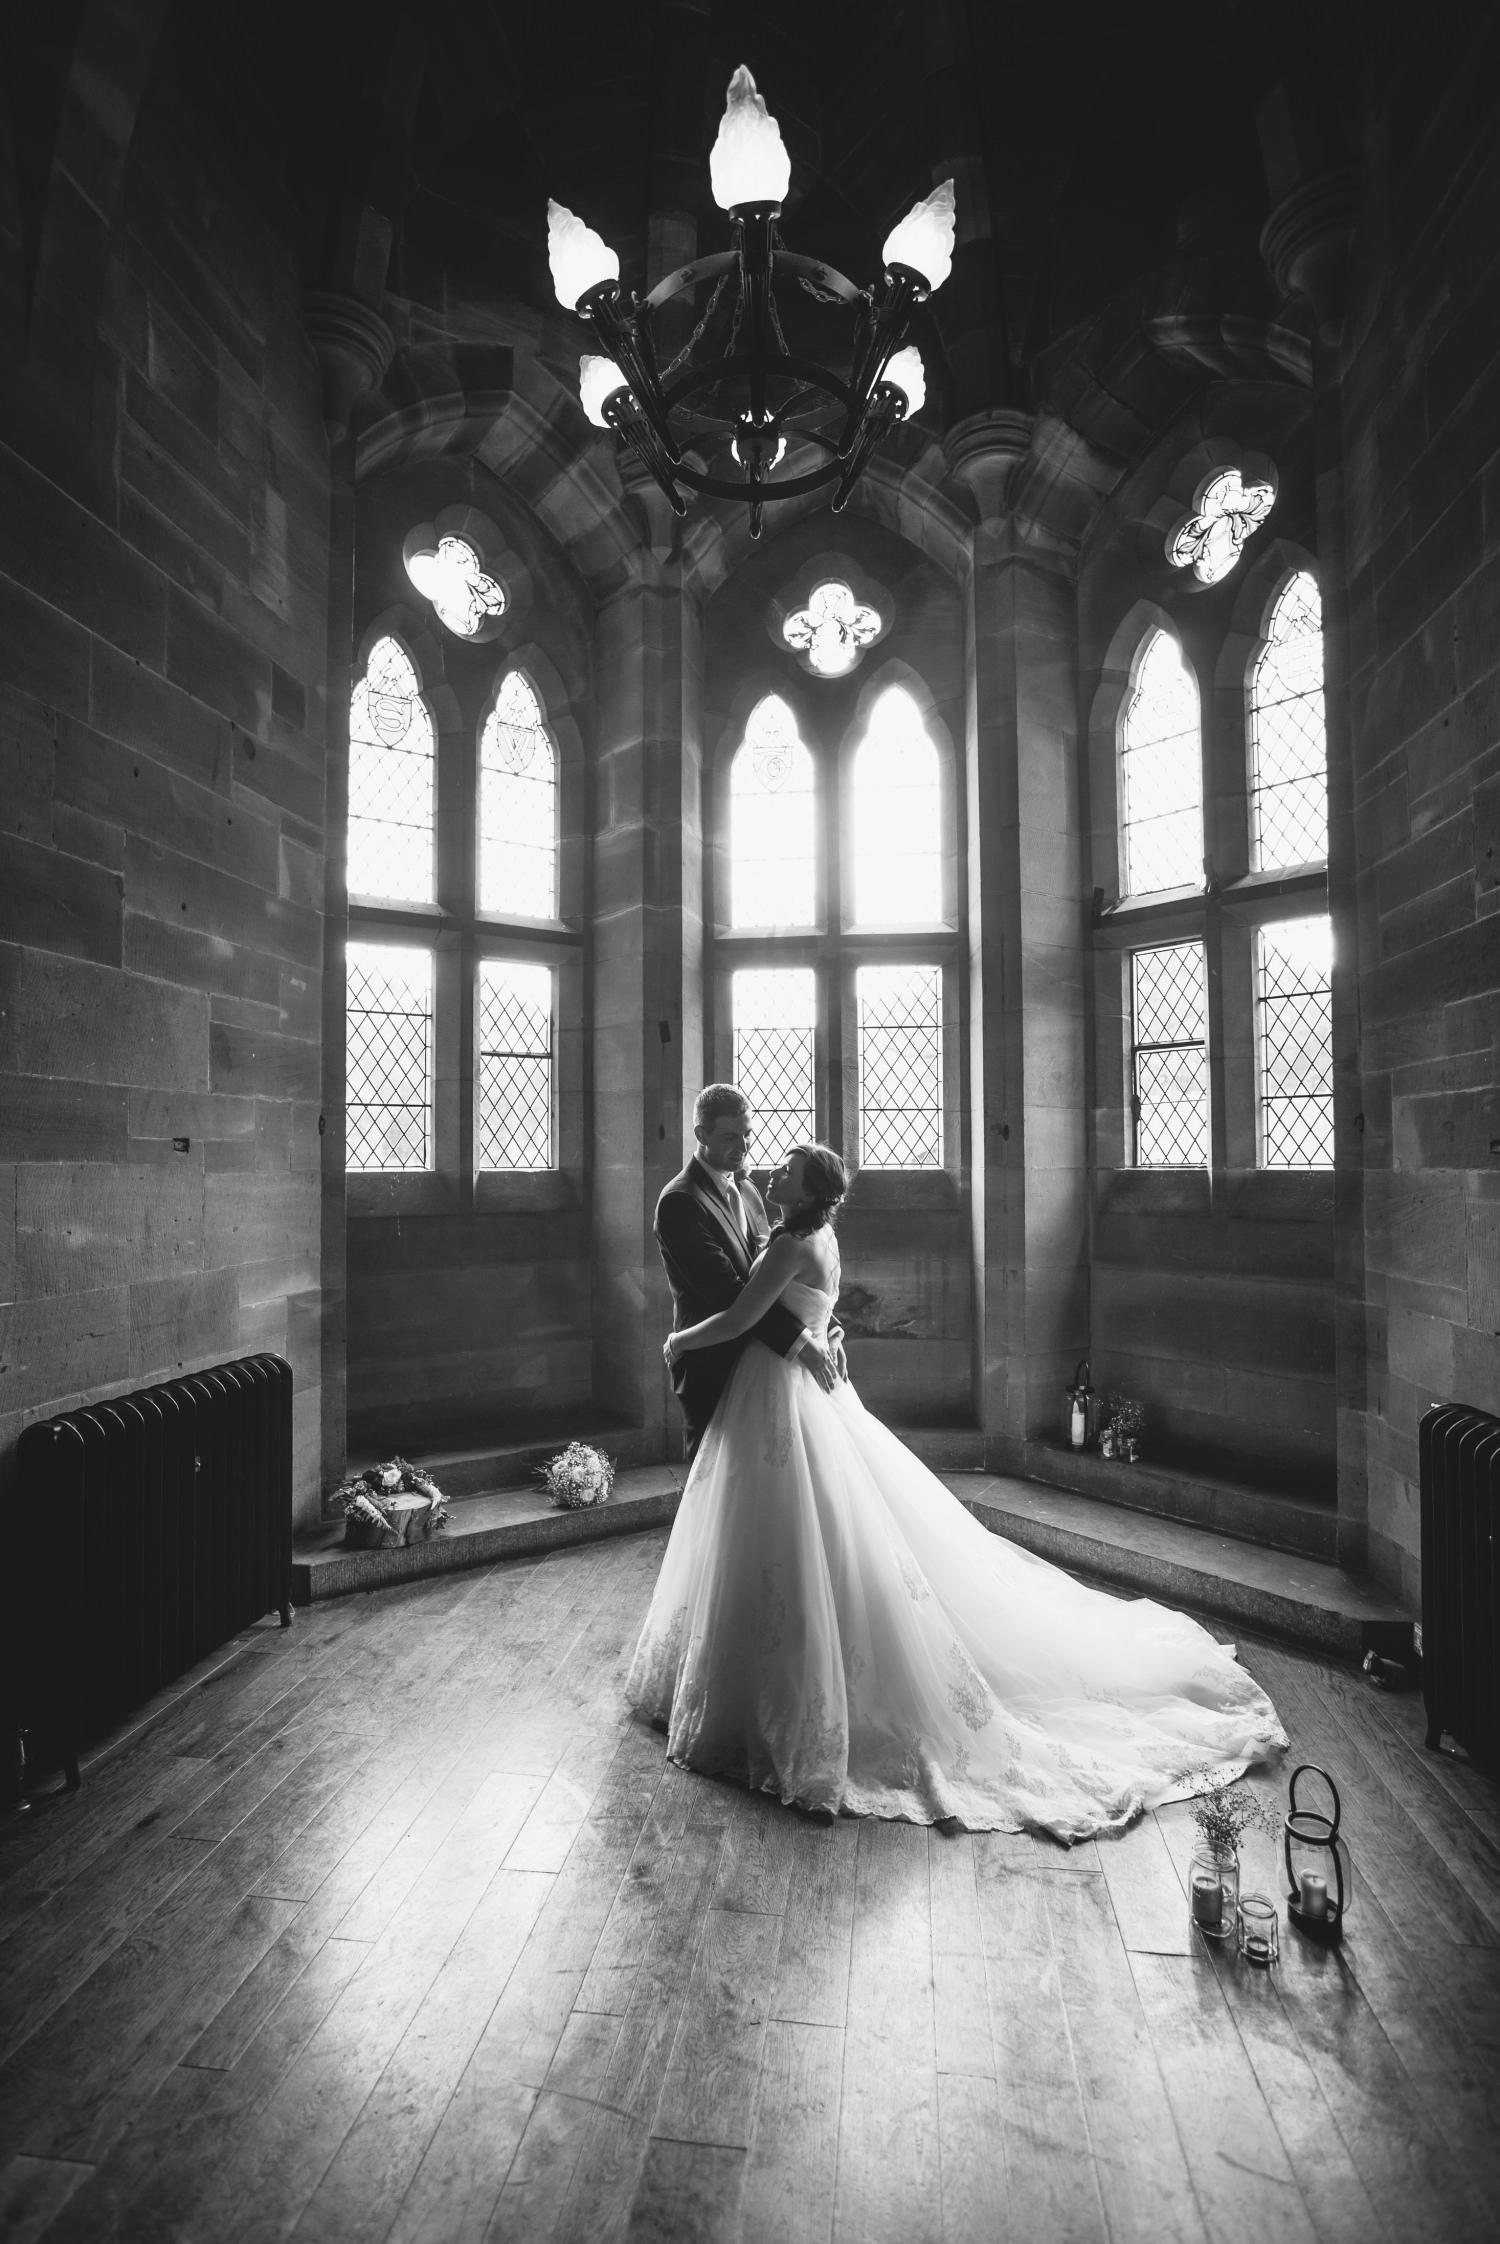 wedding portrait at Peckforton Castle, Chester